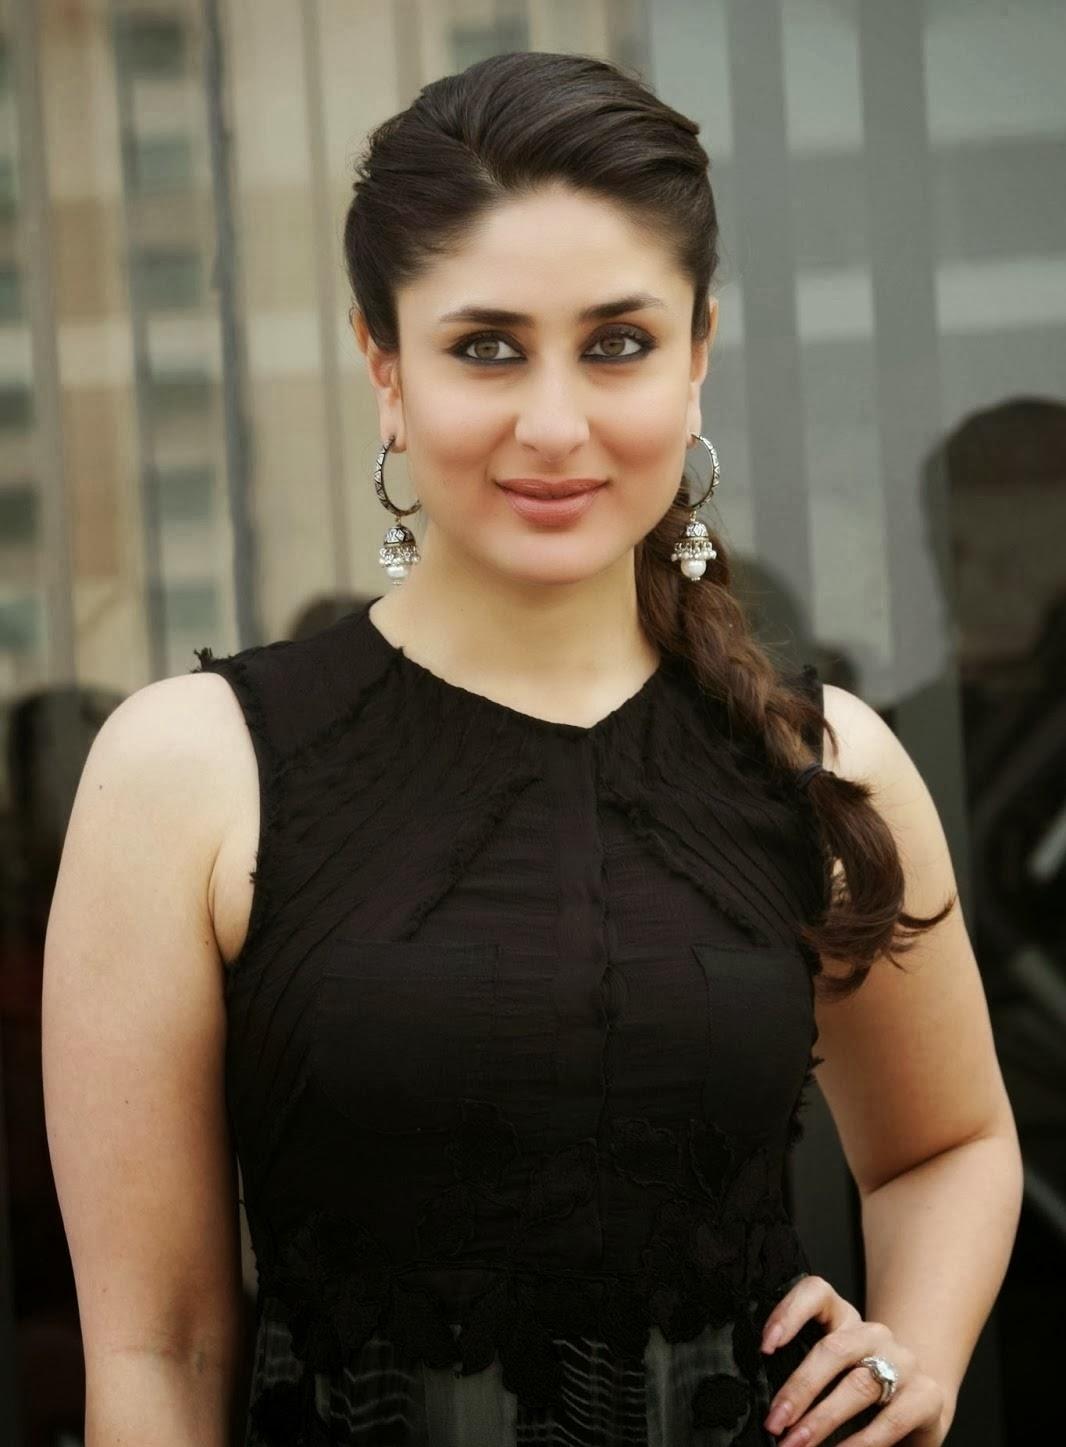 Kareena Kapoor in black outfit